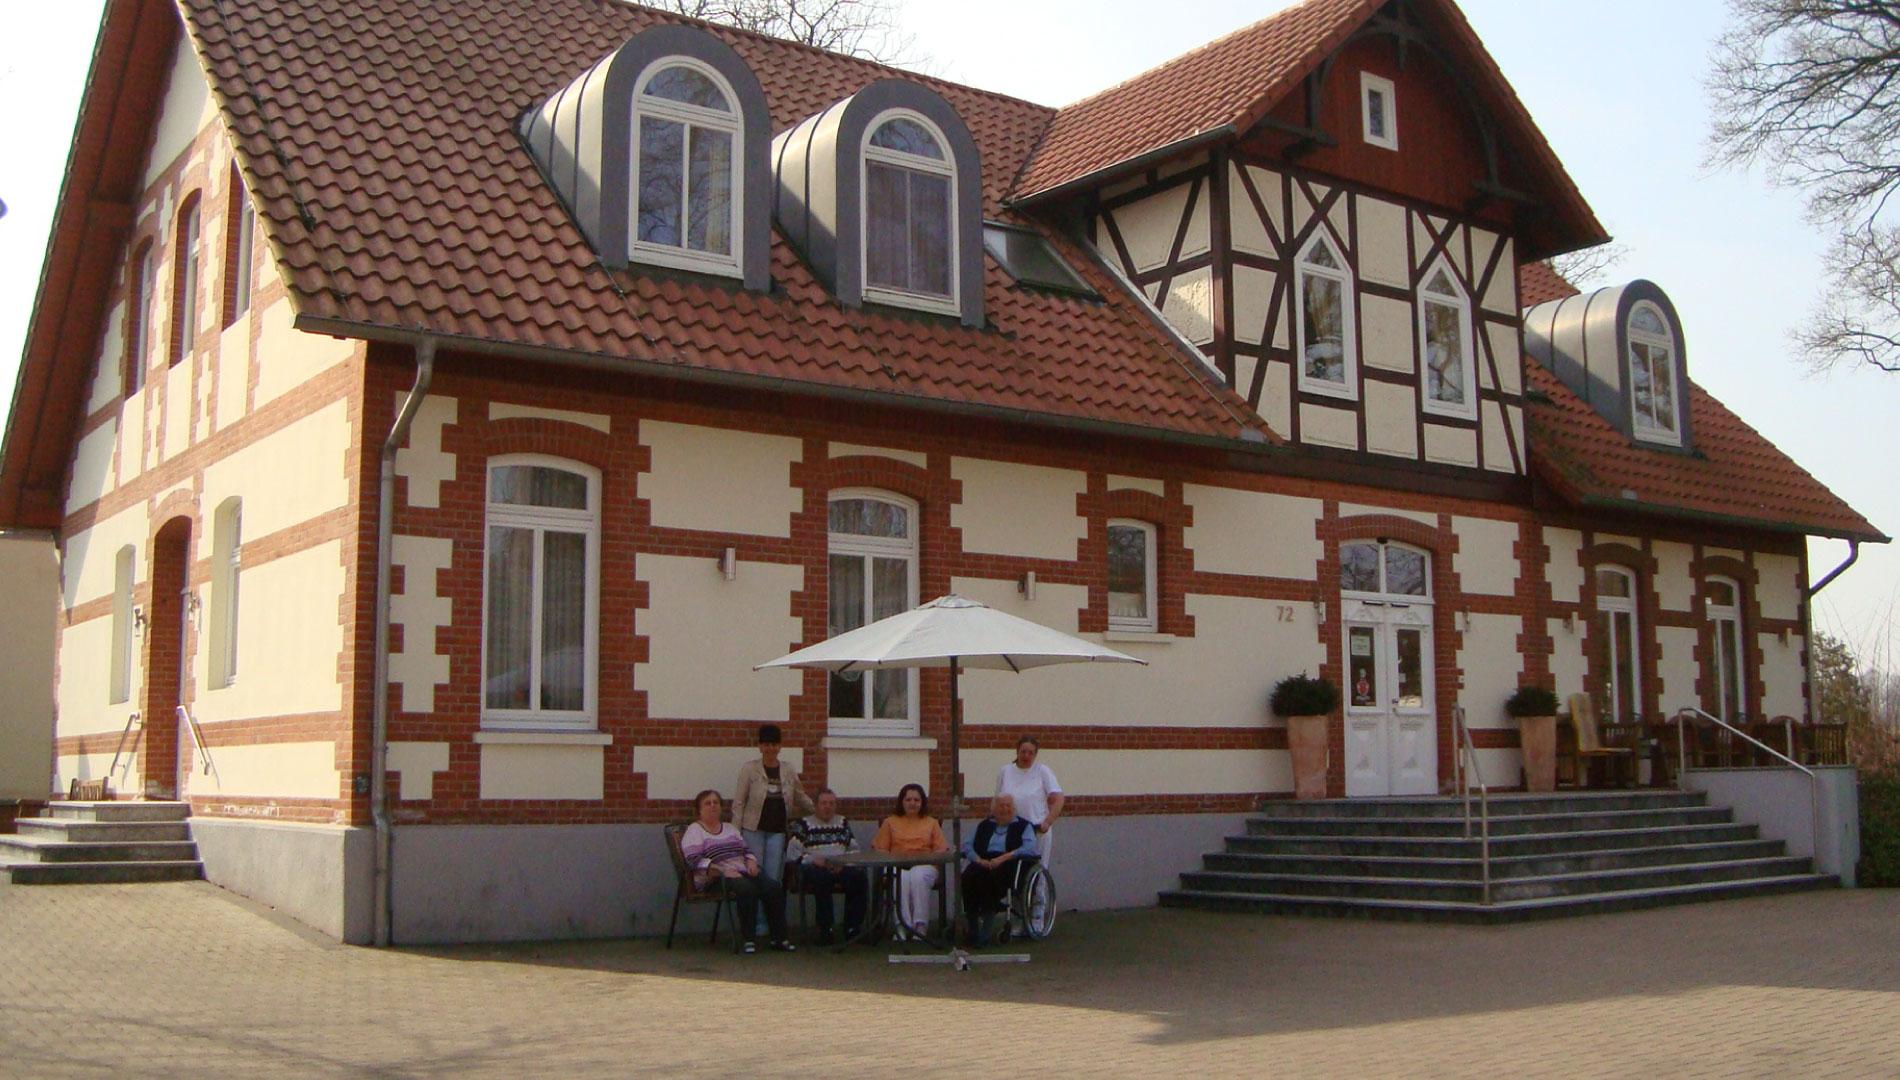 Pflege- & Betreuungszentrum Landsitz Hohenholz